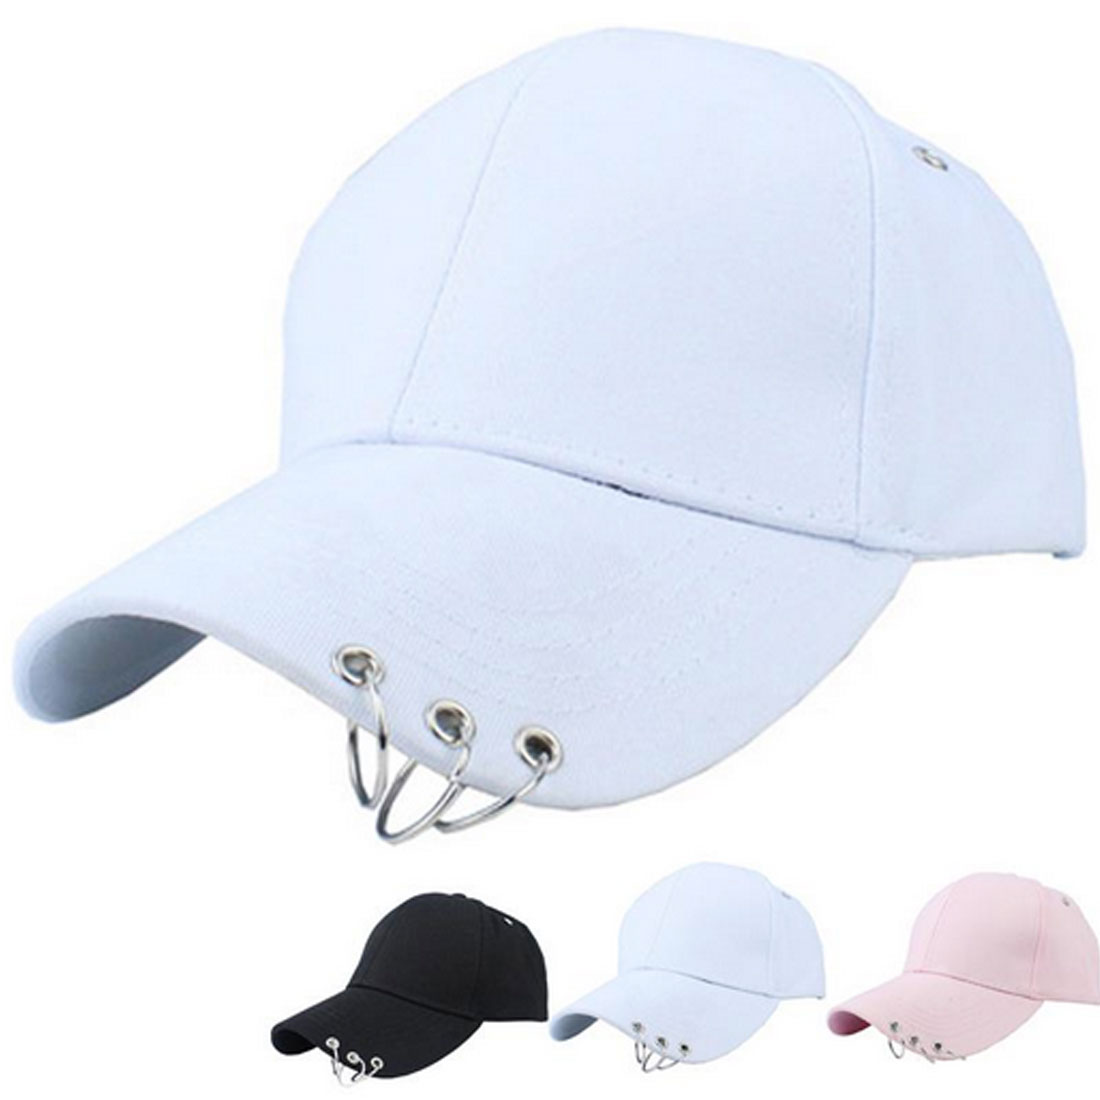 Gift baseball cap with two rings men women hip hop Rapper Popper Locker Jazz dancer cap sun hat in Men 39 s Baseball Caps from Apparel Accessories